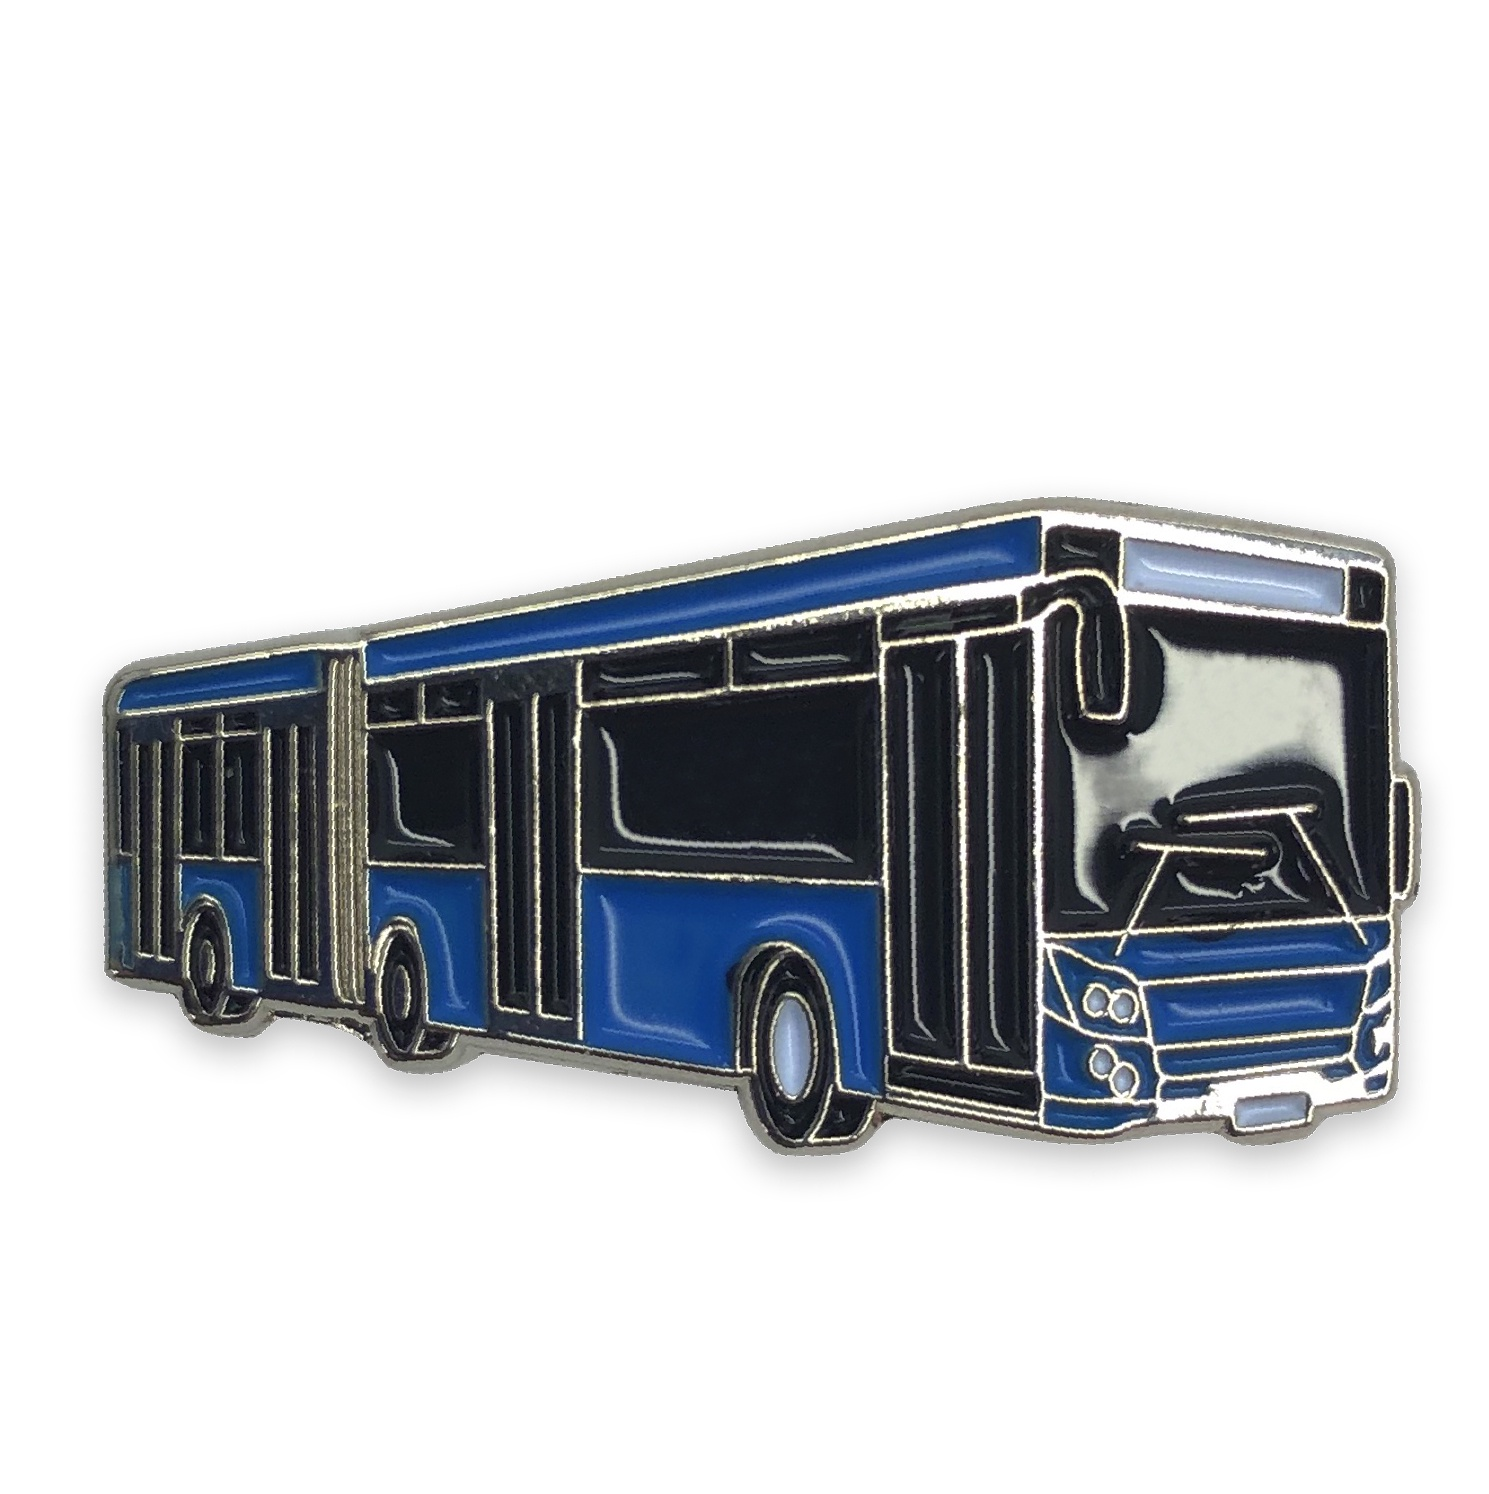 Moscow Metro Значок Автобус ЛиАЗ 6213.65 значок